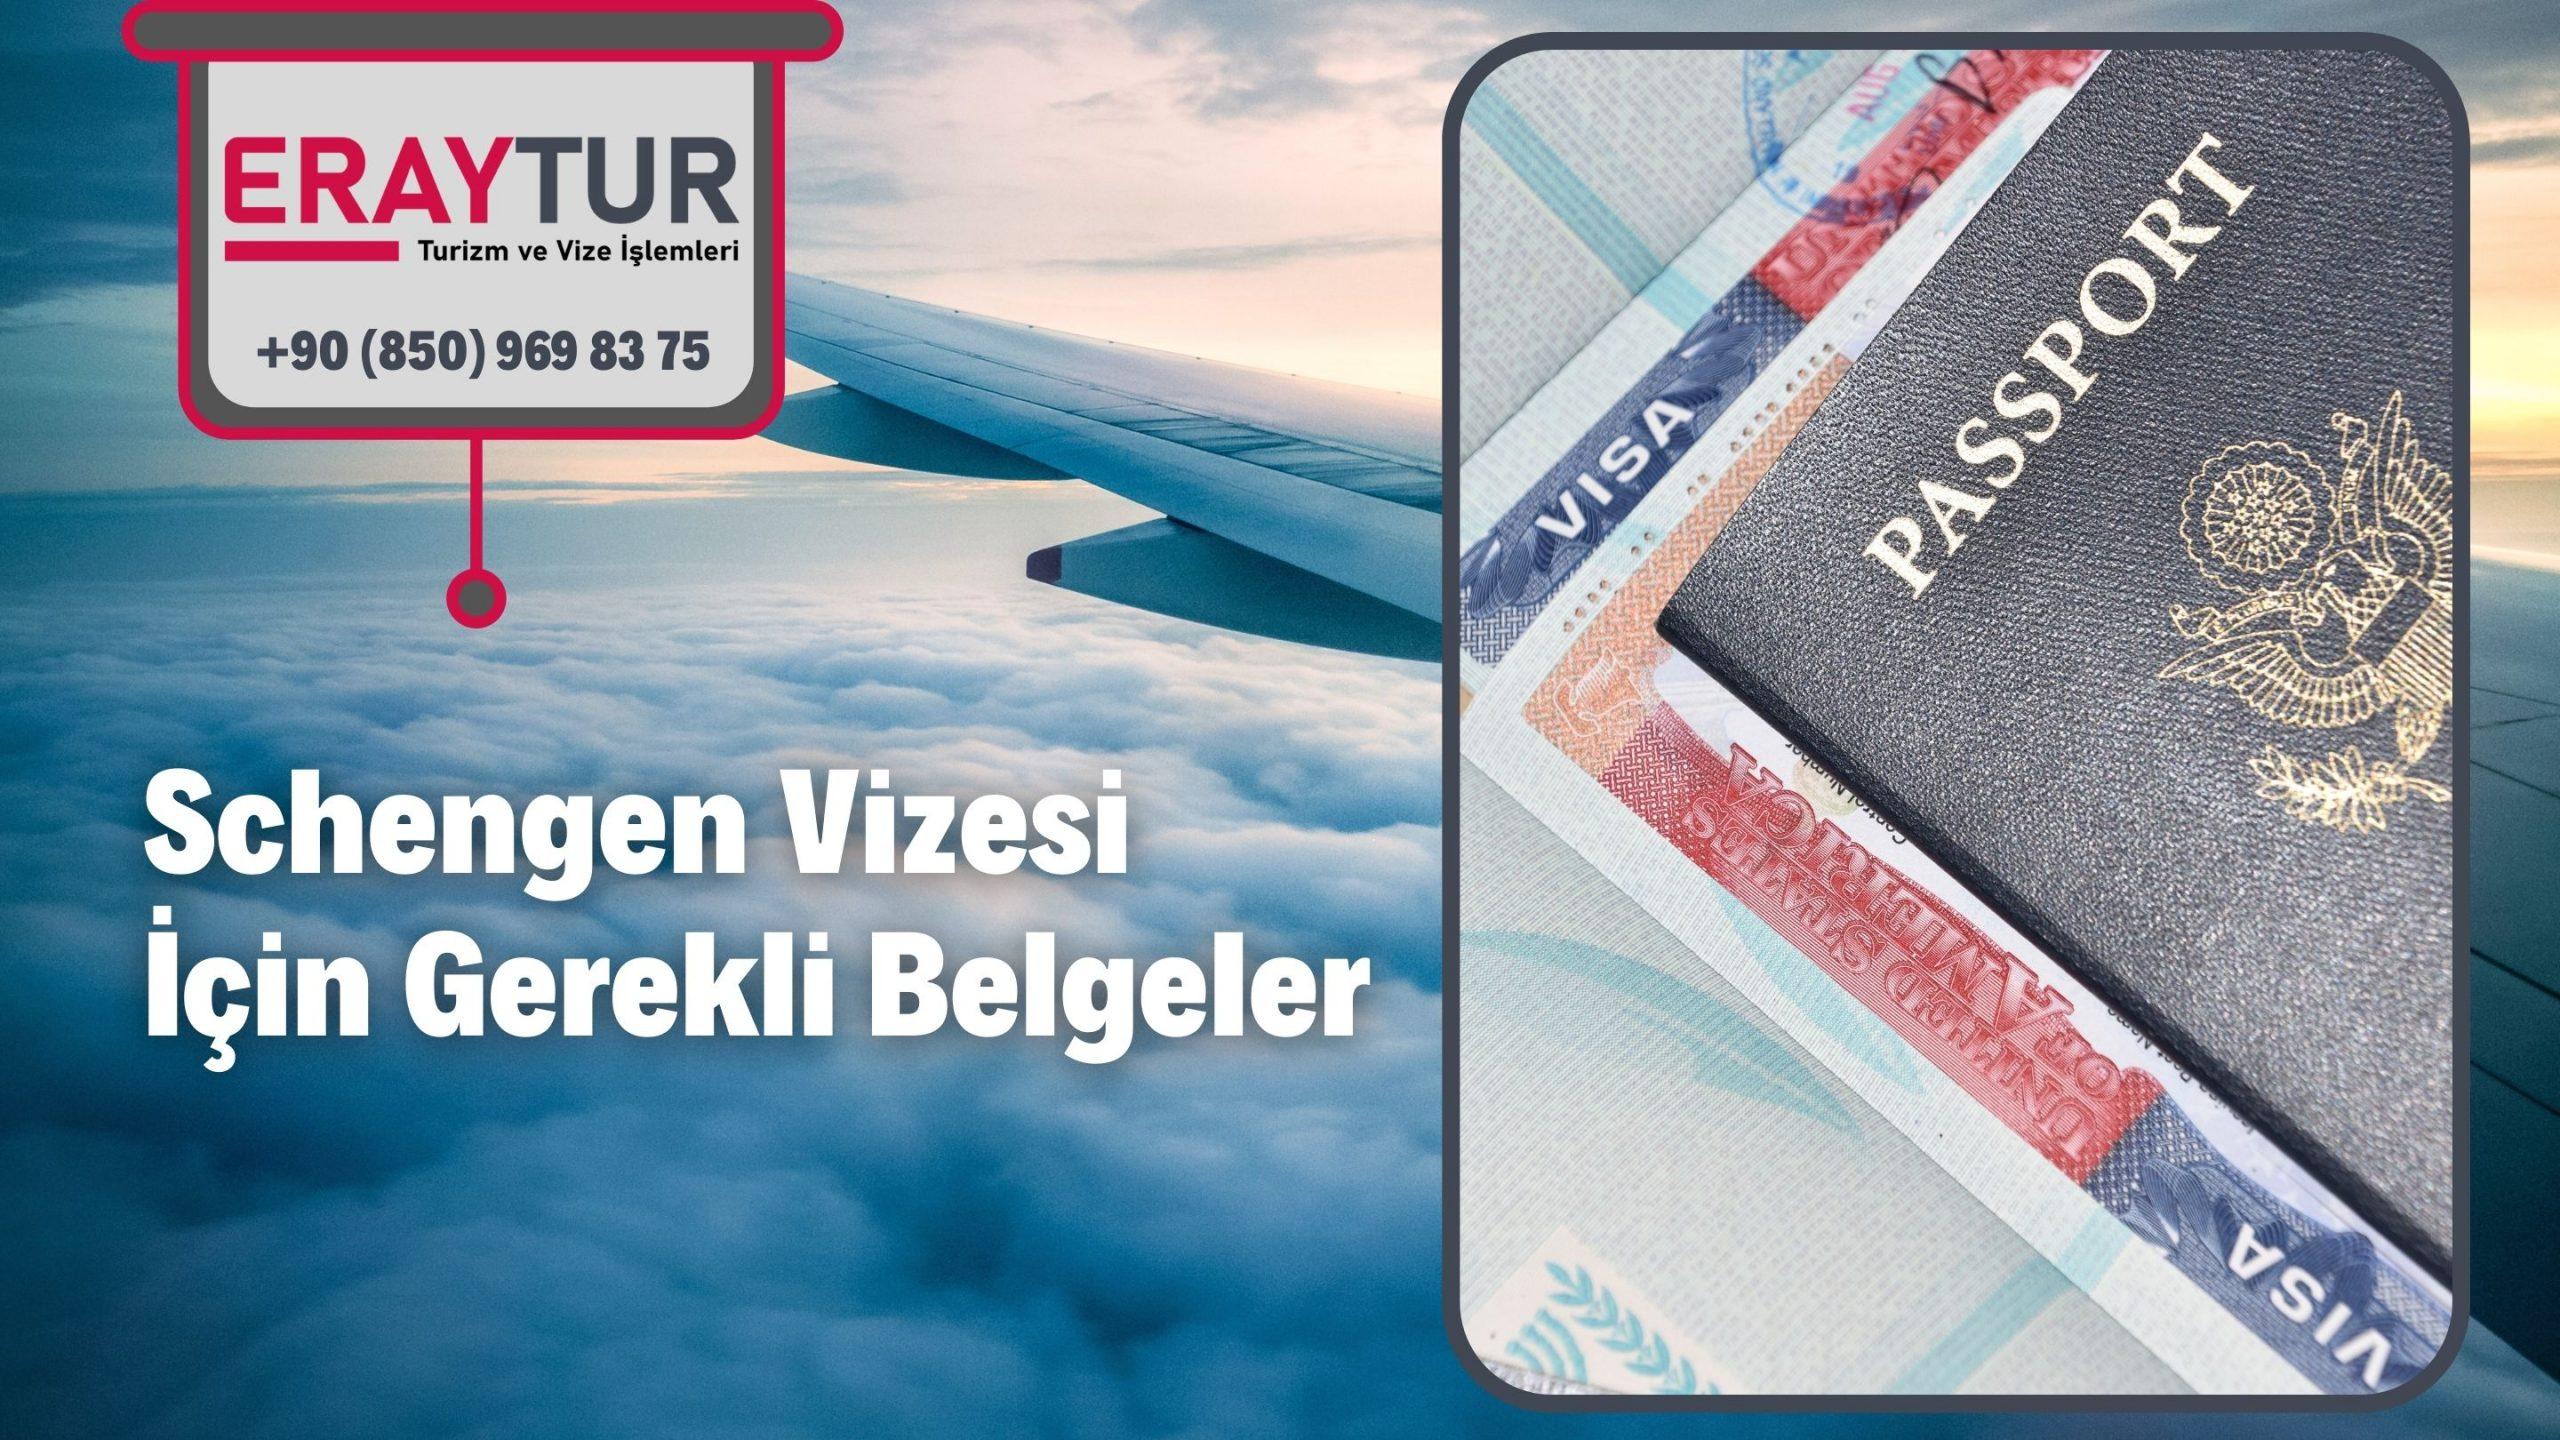 Schengen Vizesi İçin Gerekli Belgeler